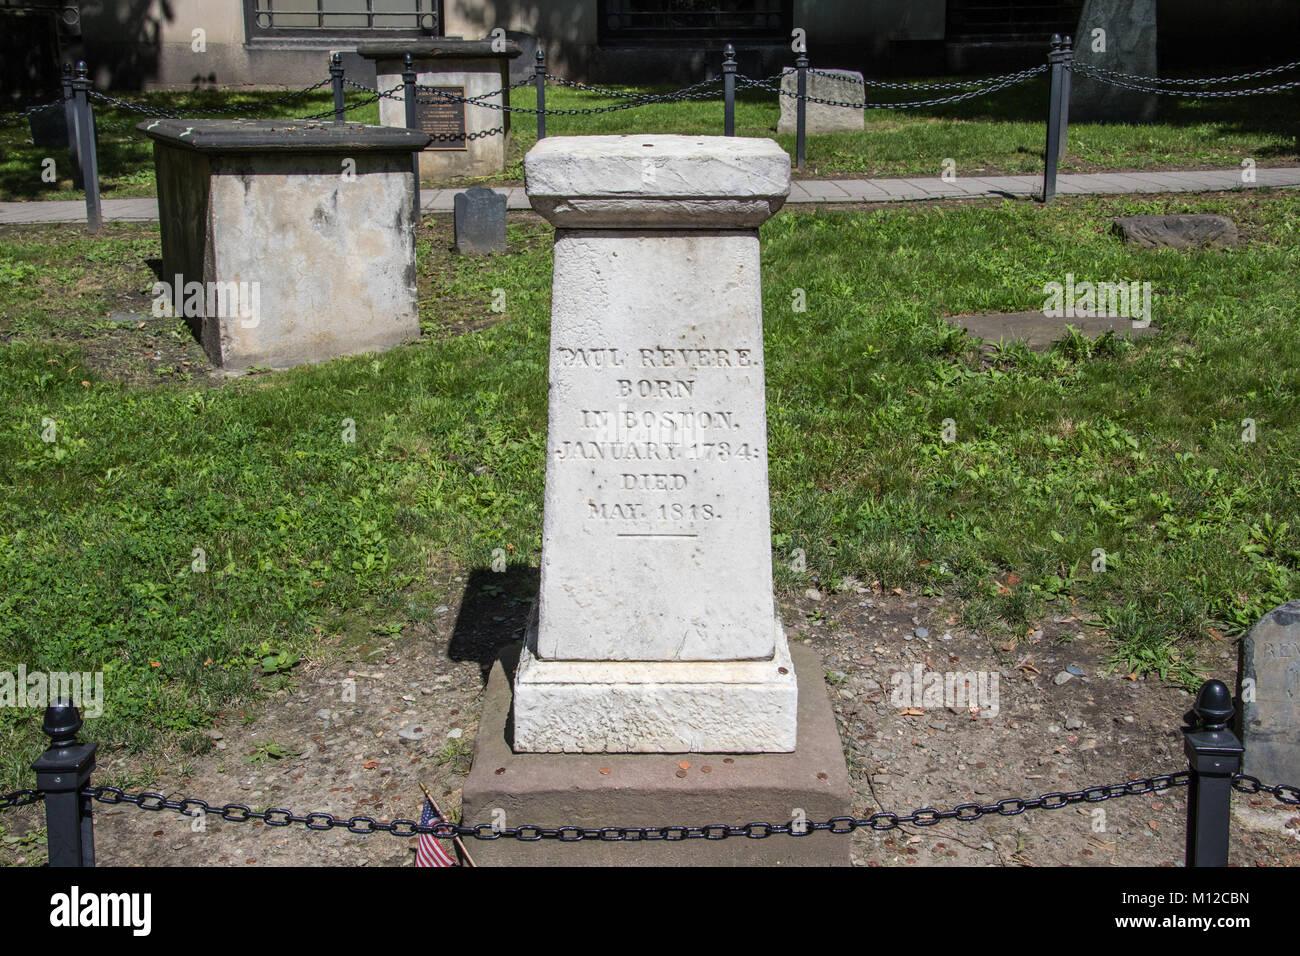 Lápida de Paul Revere, granero enterrando a tierra, Boston, MA, EE.UU. Imagen De Stock